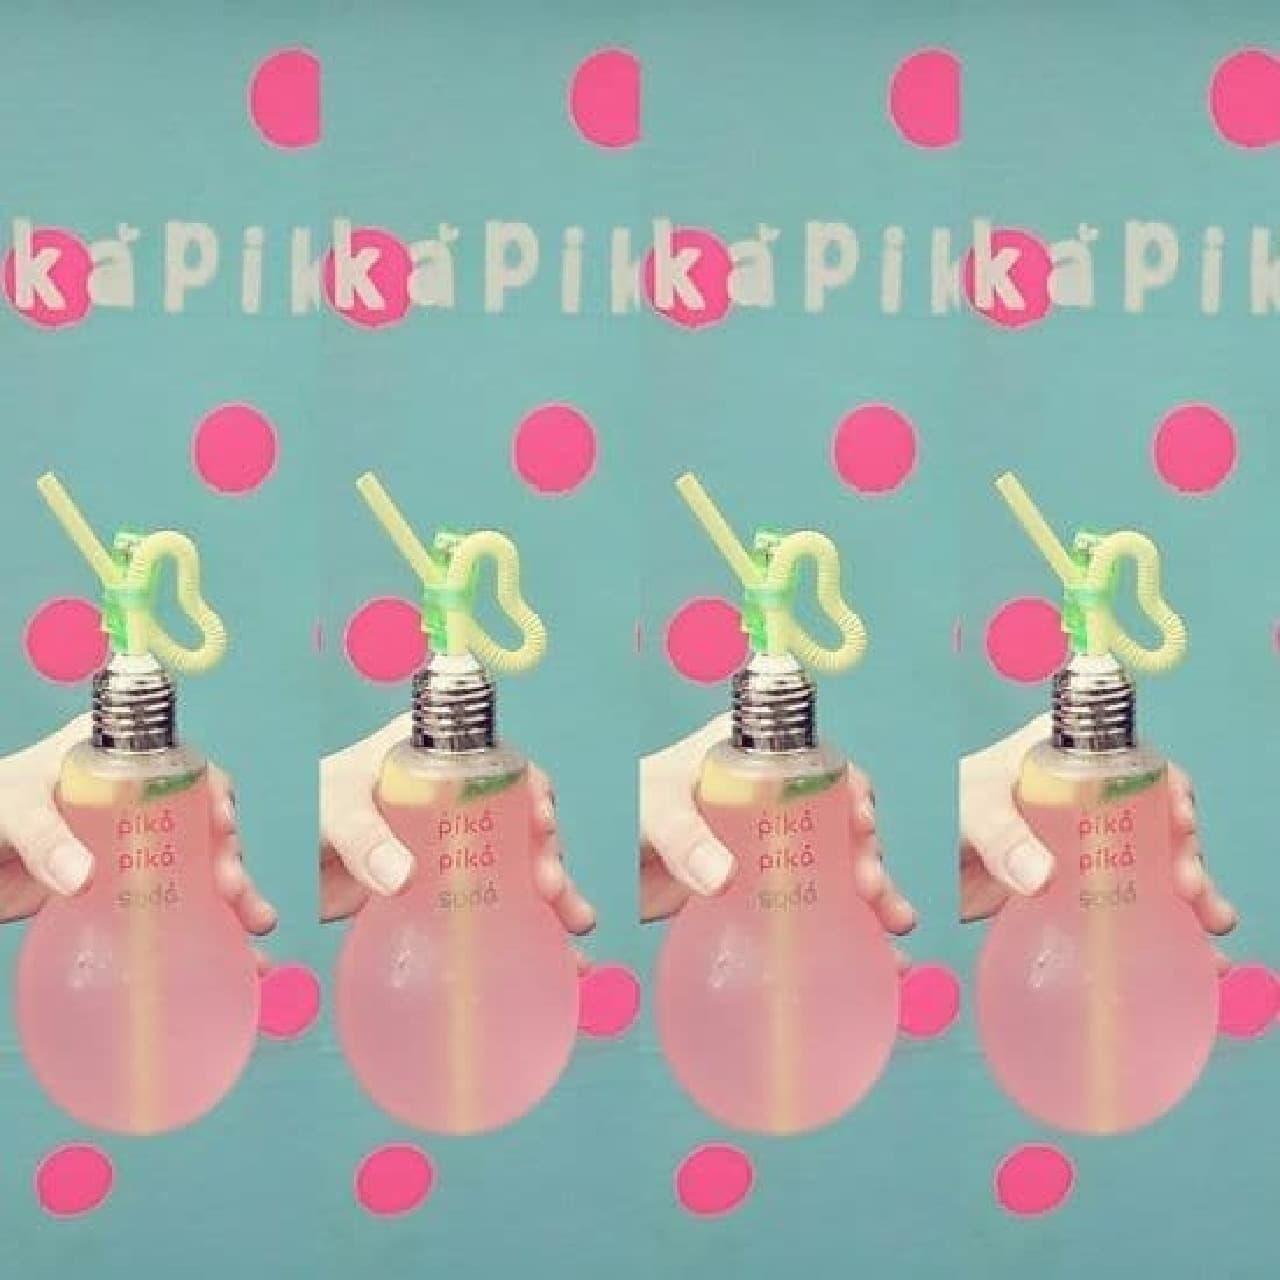 「Pika Pika Soda」は、プラスチック製の電球ボトルに入ったソーダ「電球型ソーダ」を販売するお店